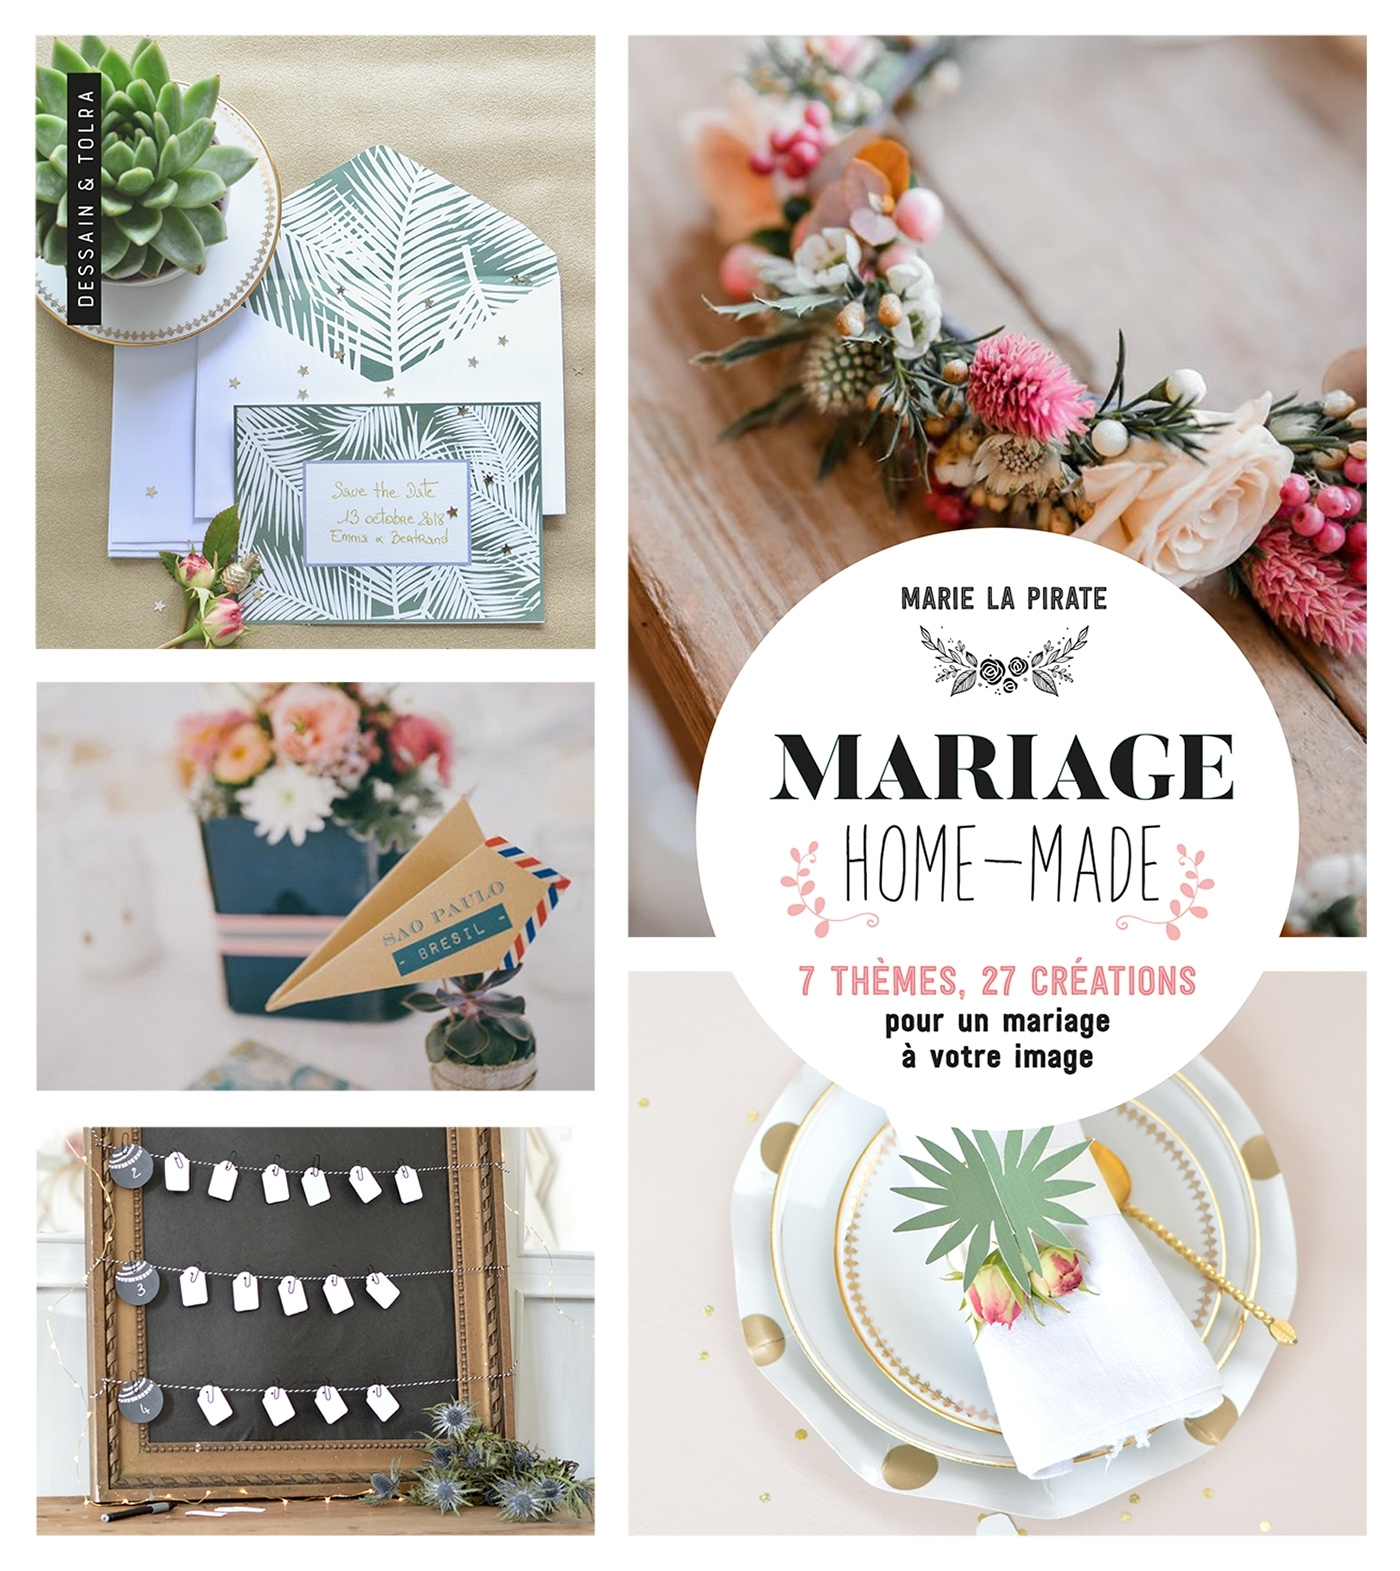 MARIAGE HOMEMADE - 7 THEMES, 27 CREATIONS POUR UN MARIAGE A VOTRE IMAGE